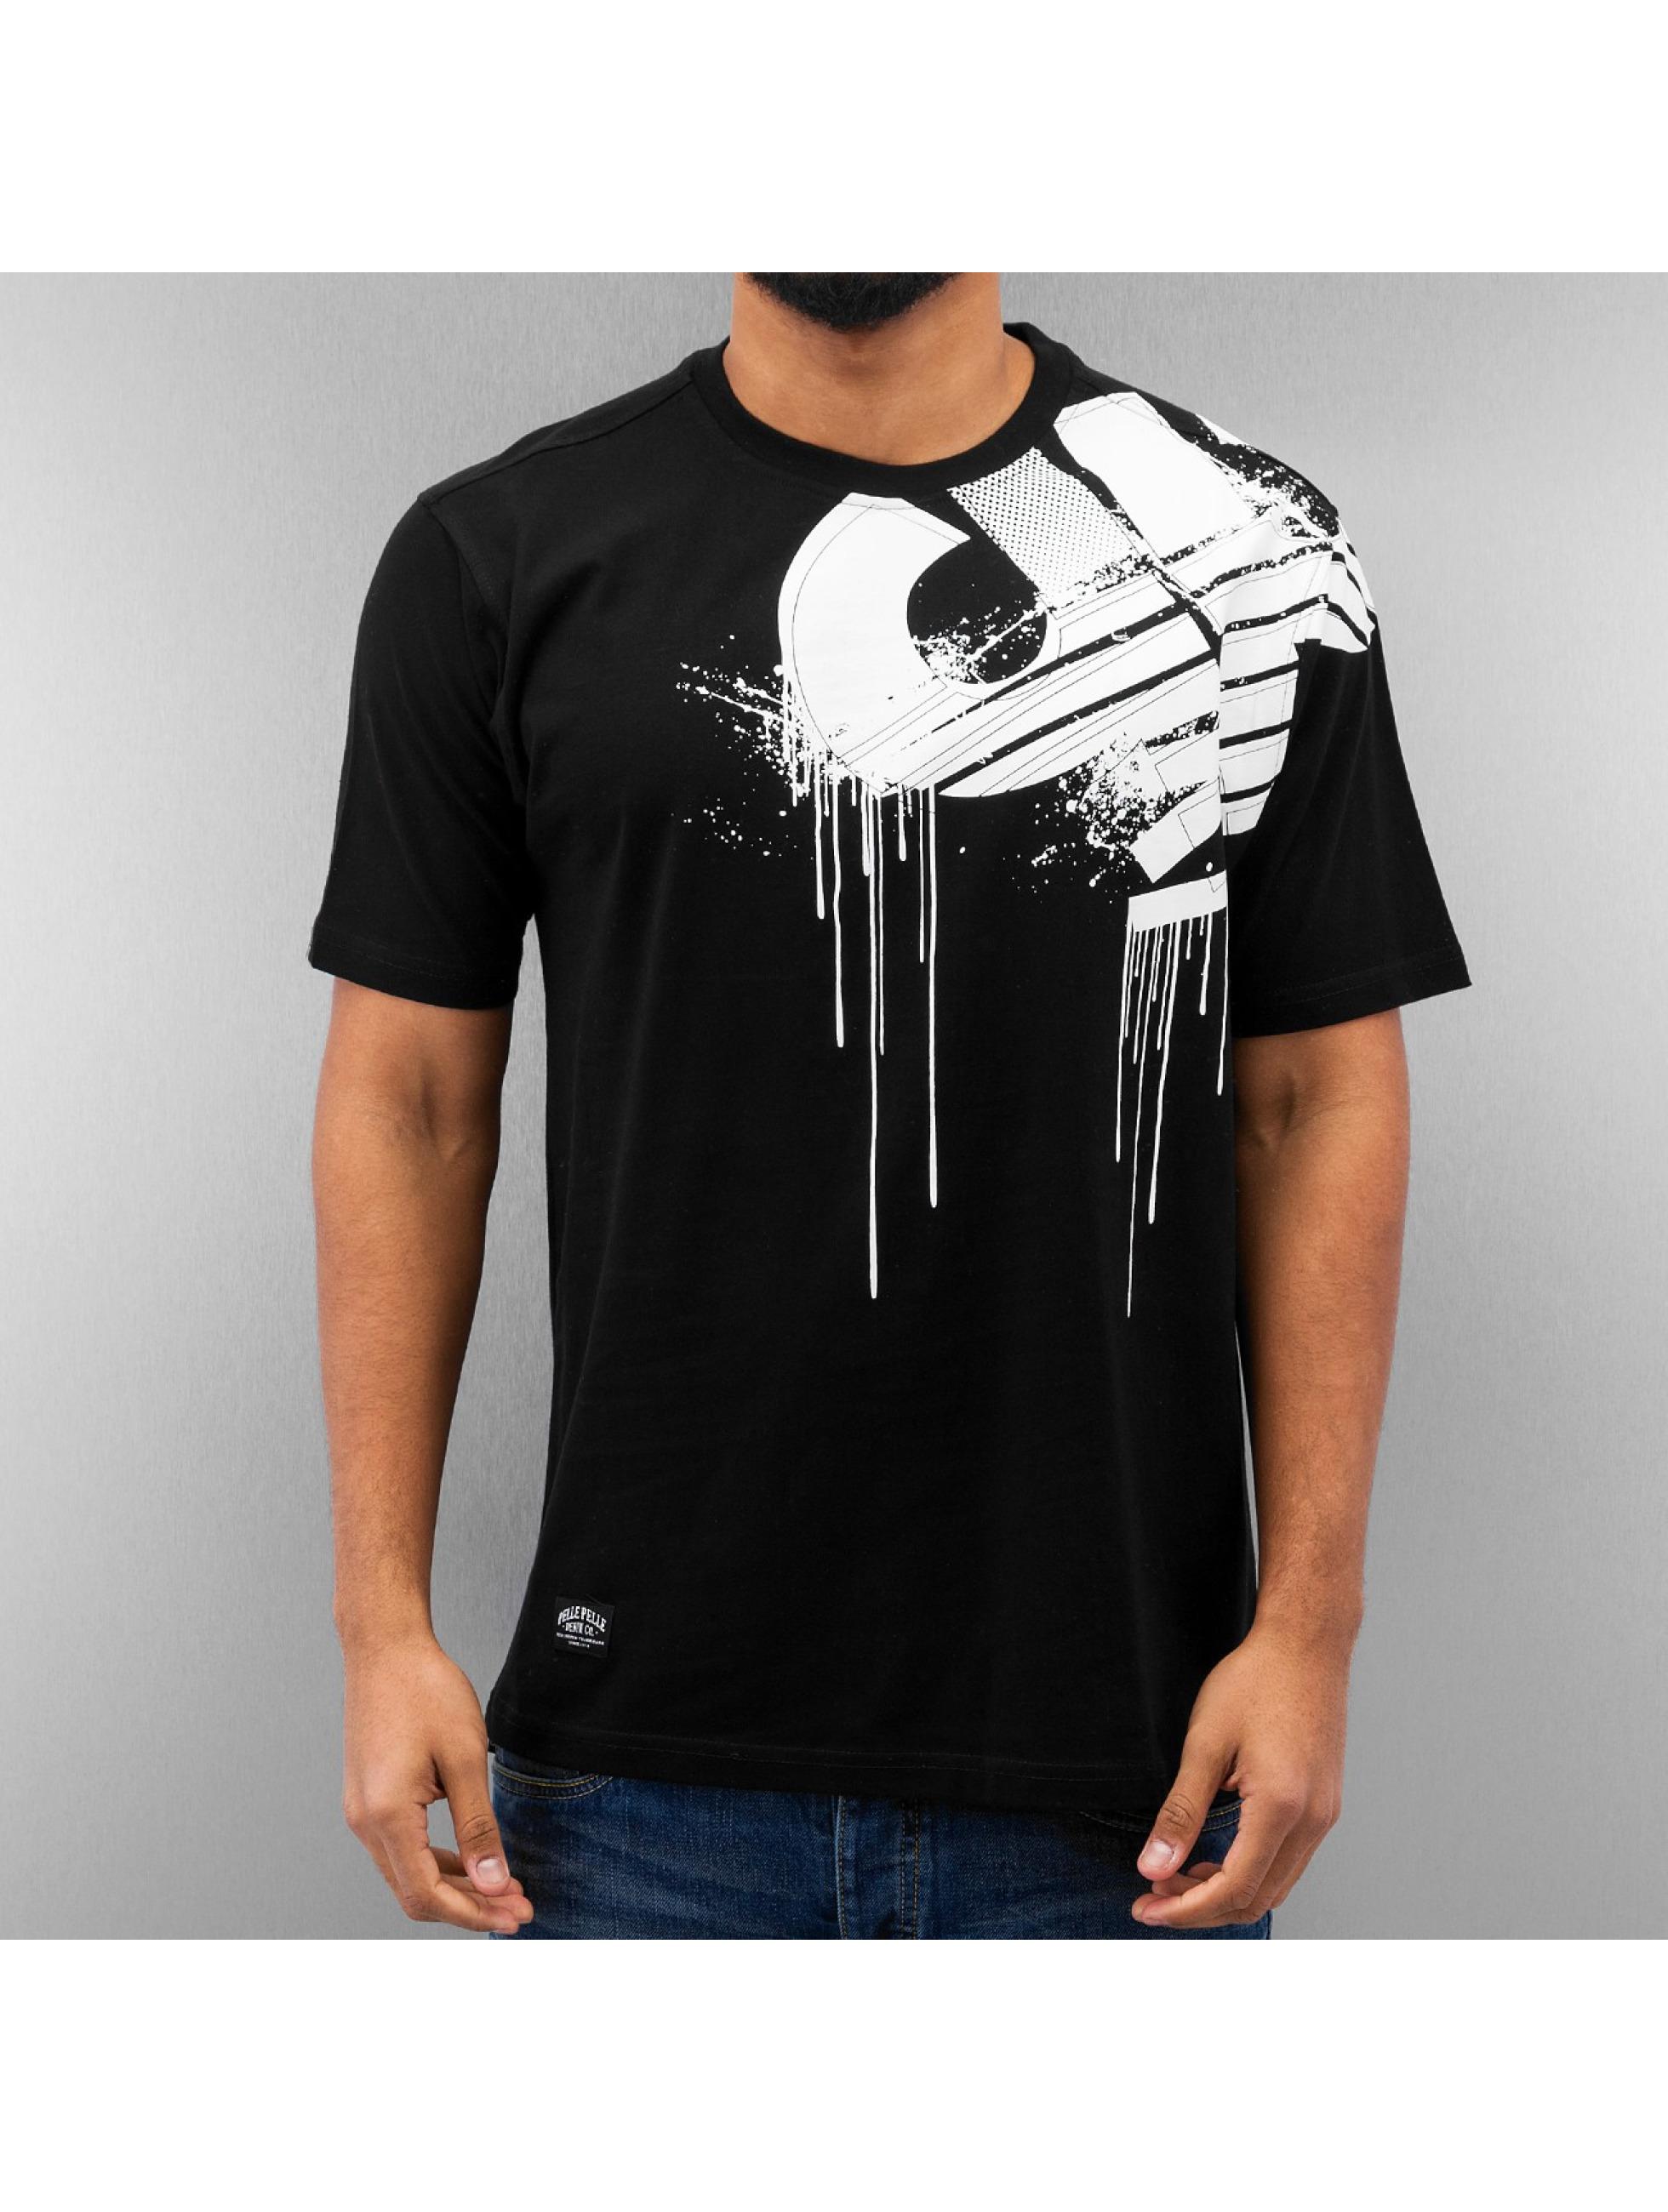 Pelle Pelle T-Shirt Demolition schwarz